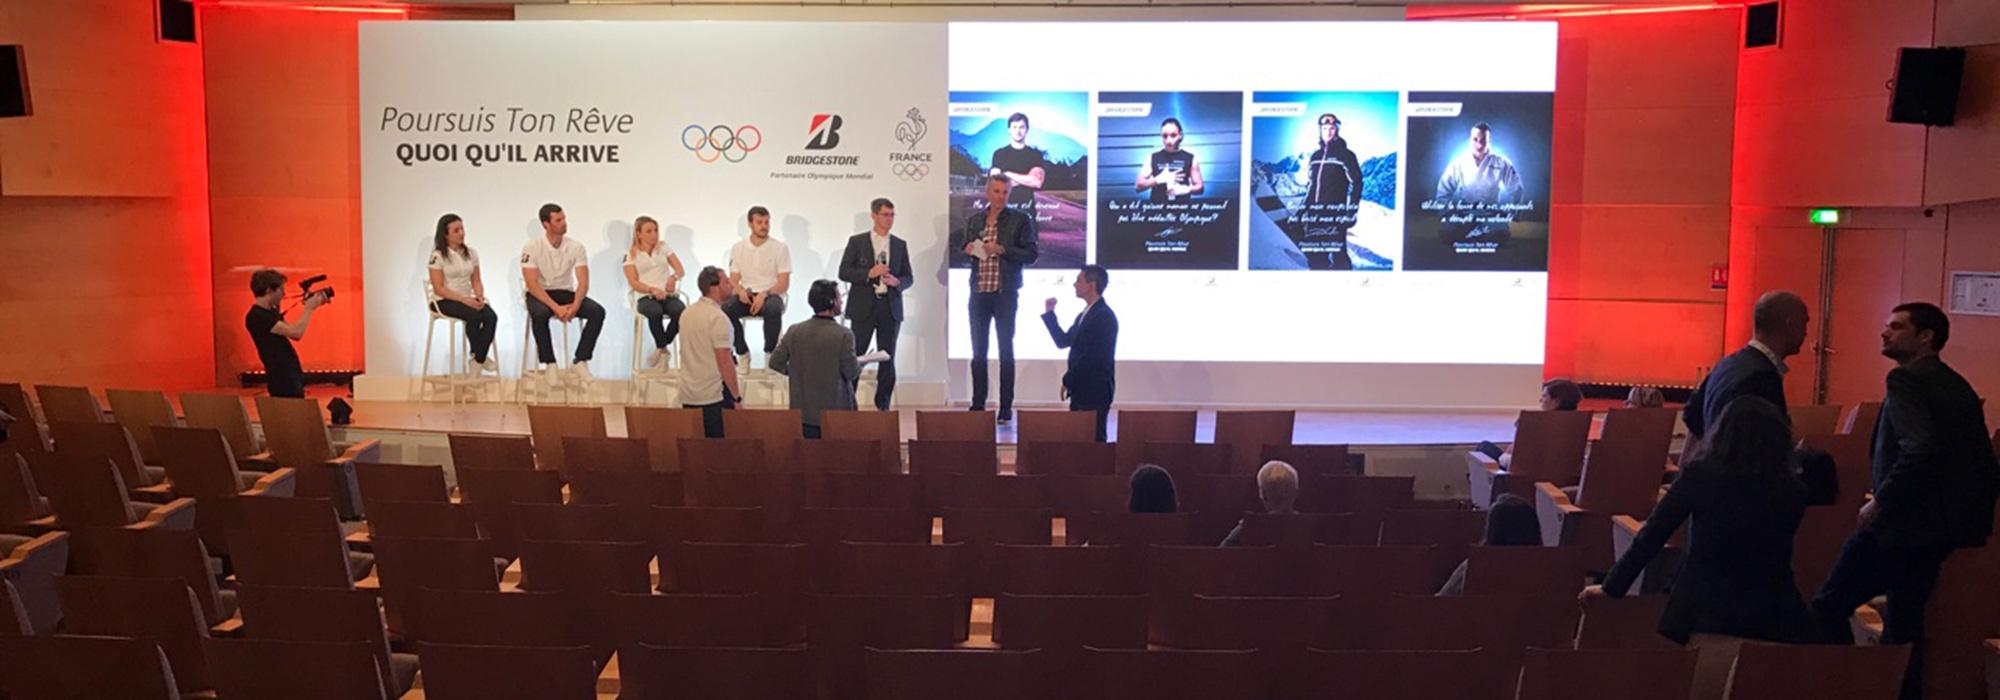 artcomvideo-comite-olympique-10